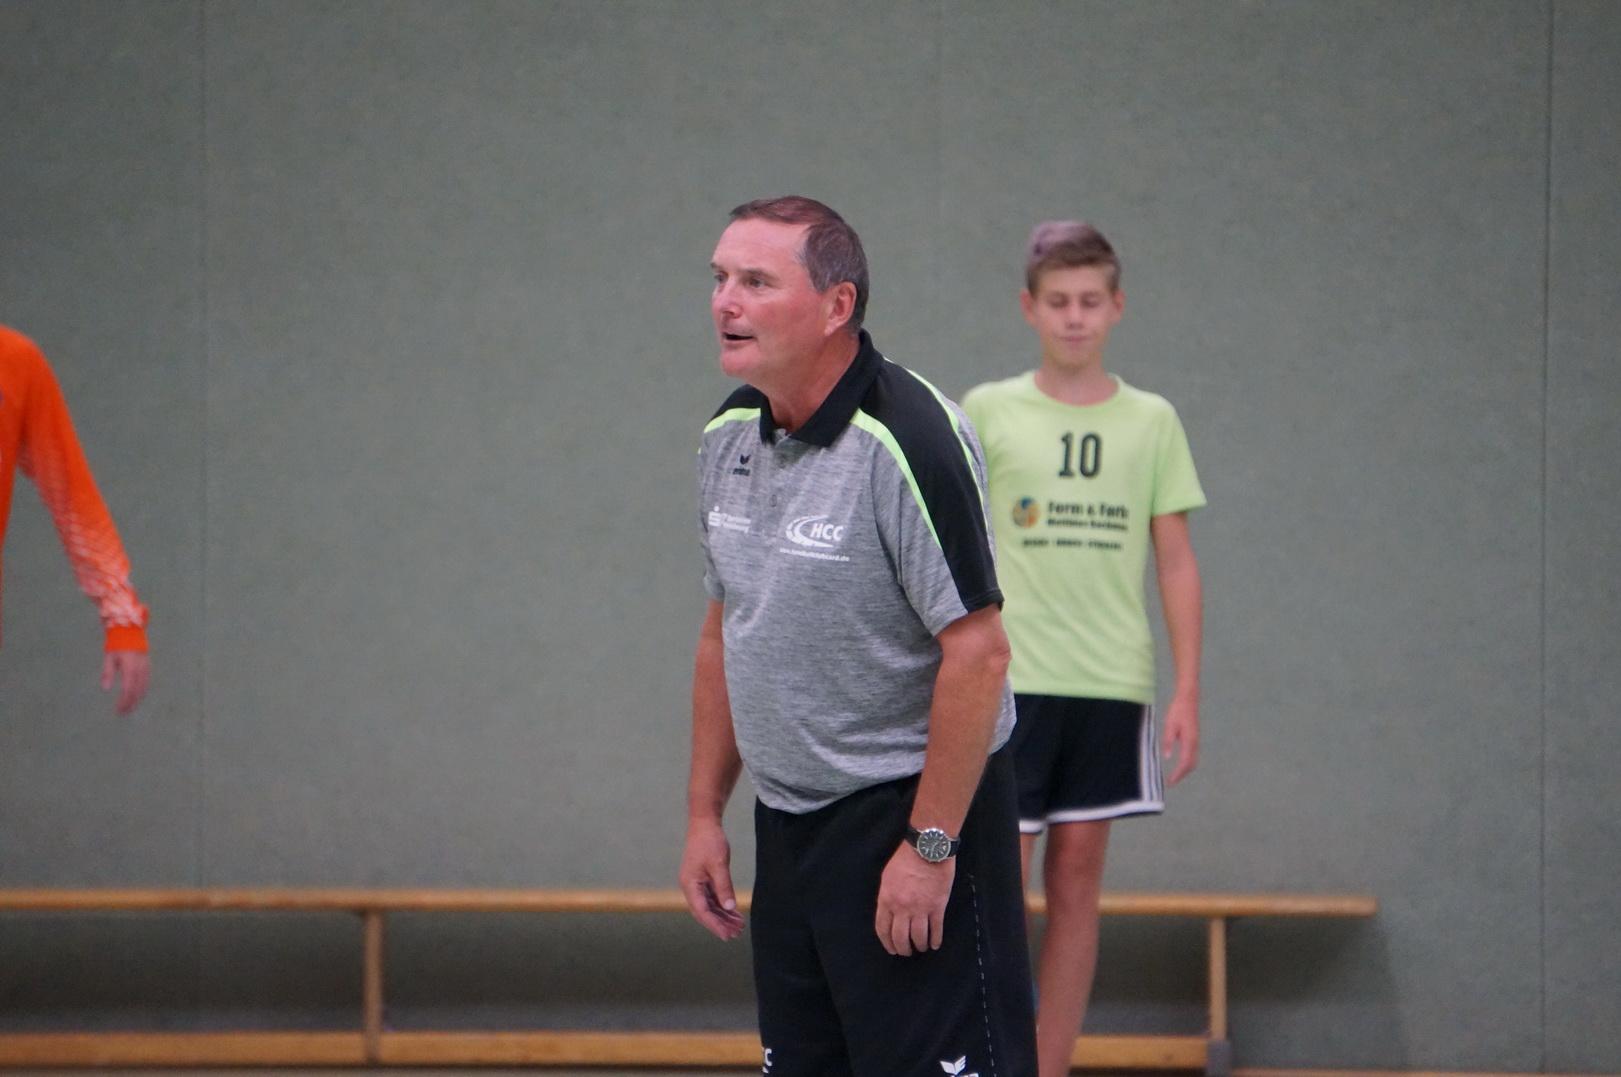 201808_Handballcamp_SDH_MG_050w